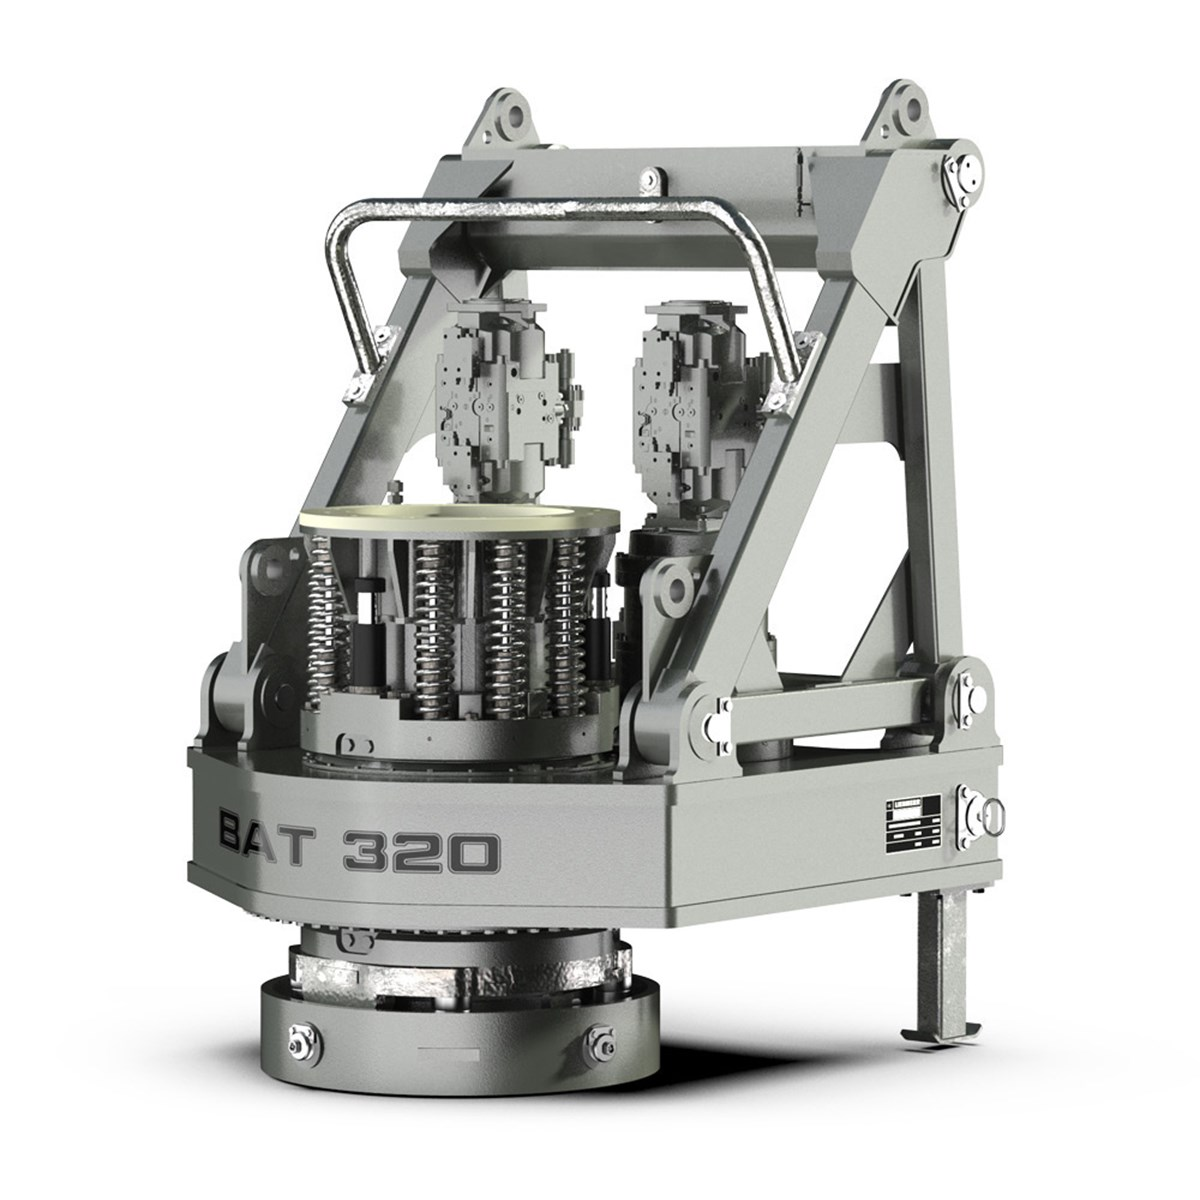 liebherr-bat-320-rotary-drive-bohrantrieb-for-lb-28-drilling-rig.jpg